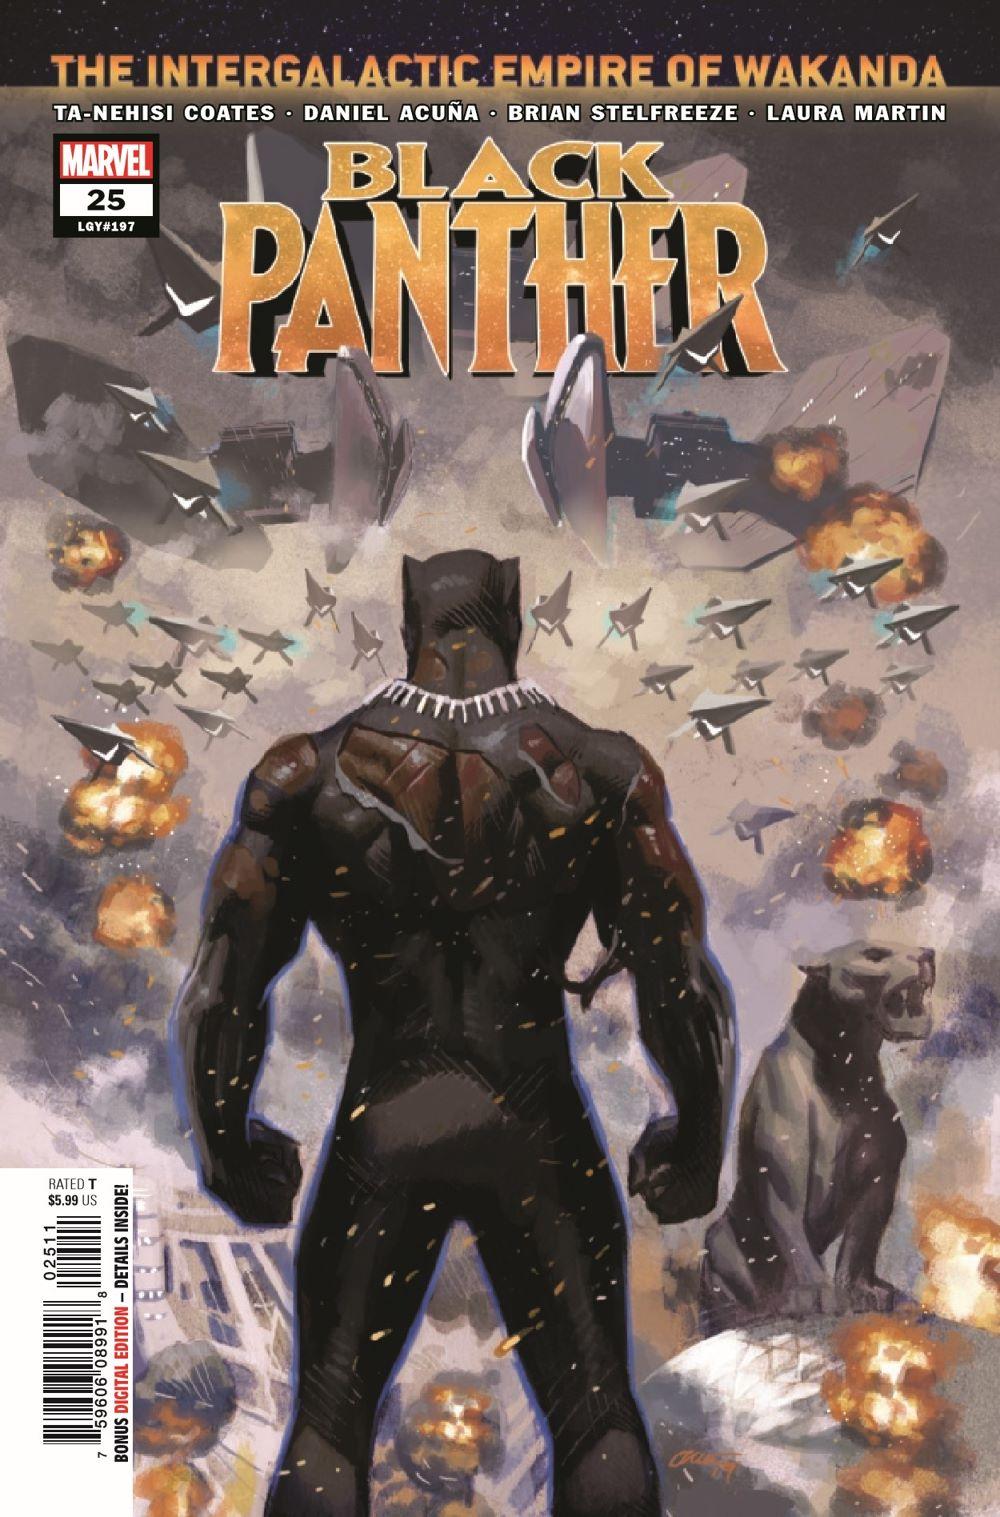 BLAP2018025_Preview-1 ComicList Previews: BLACK PANTHER #25